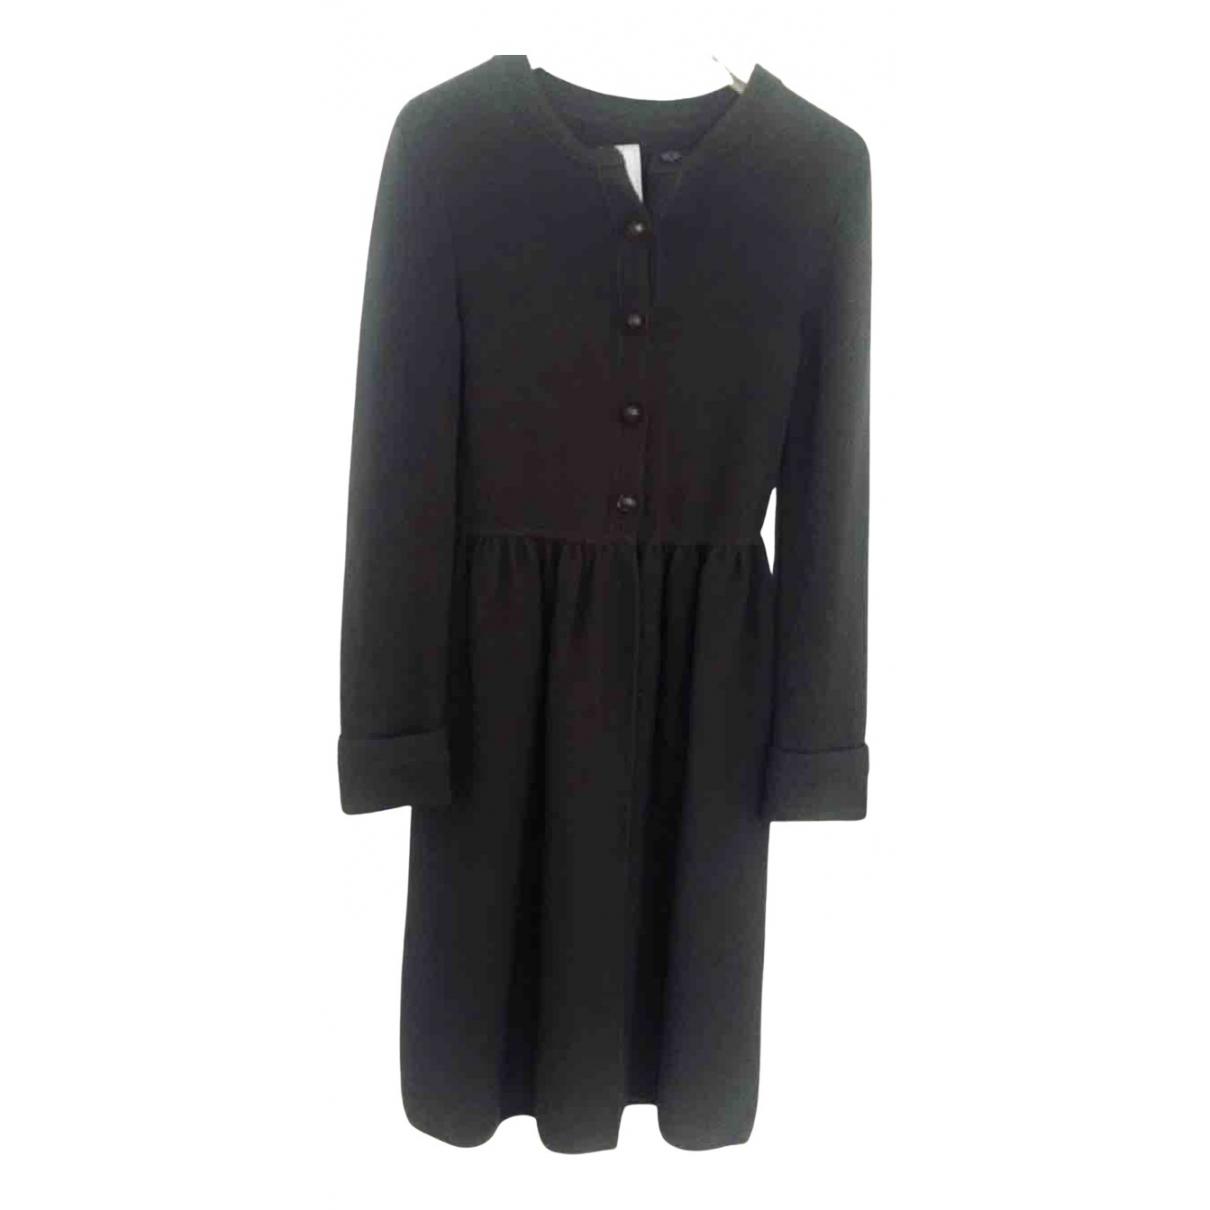 Fendi \N Kleid in  Anthrazit Wolle